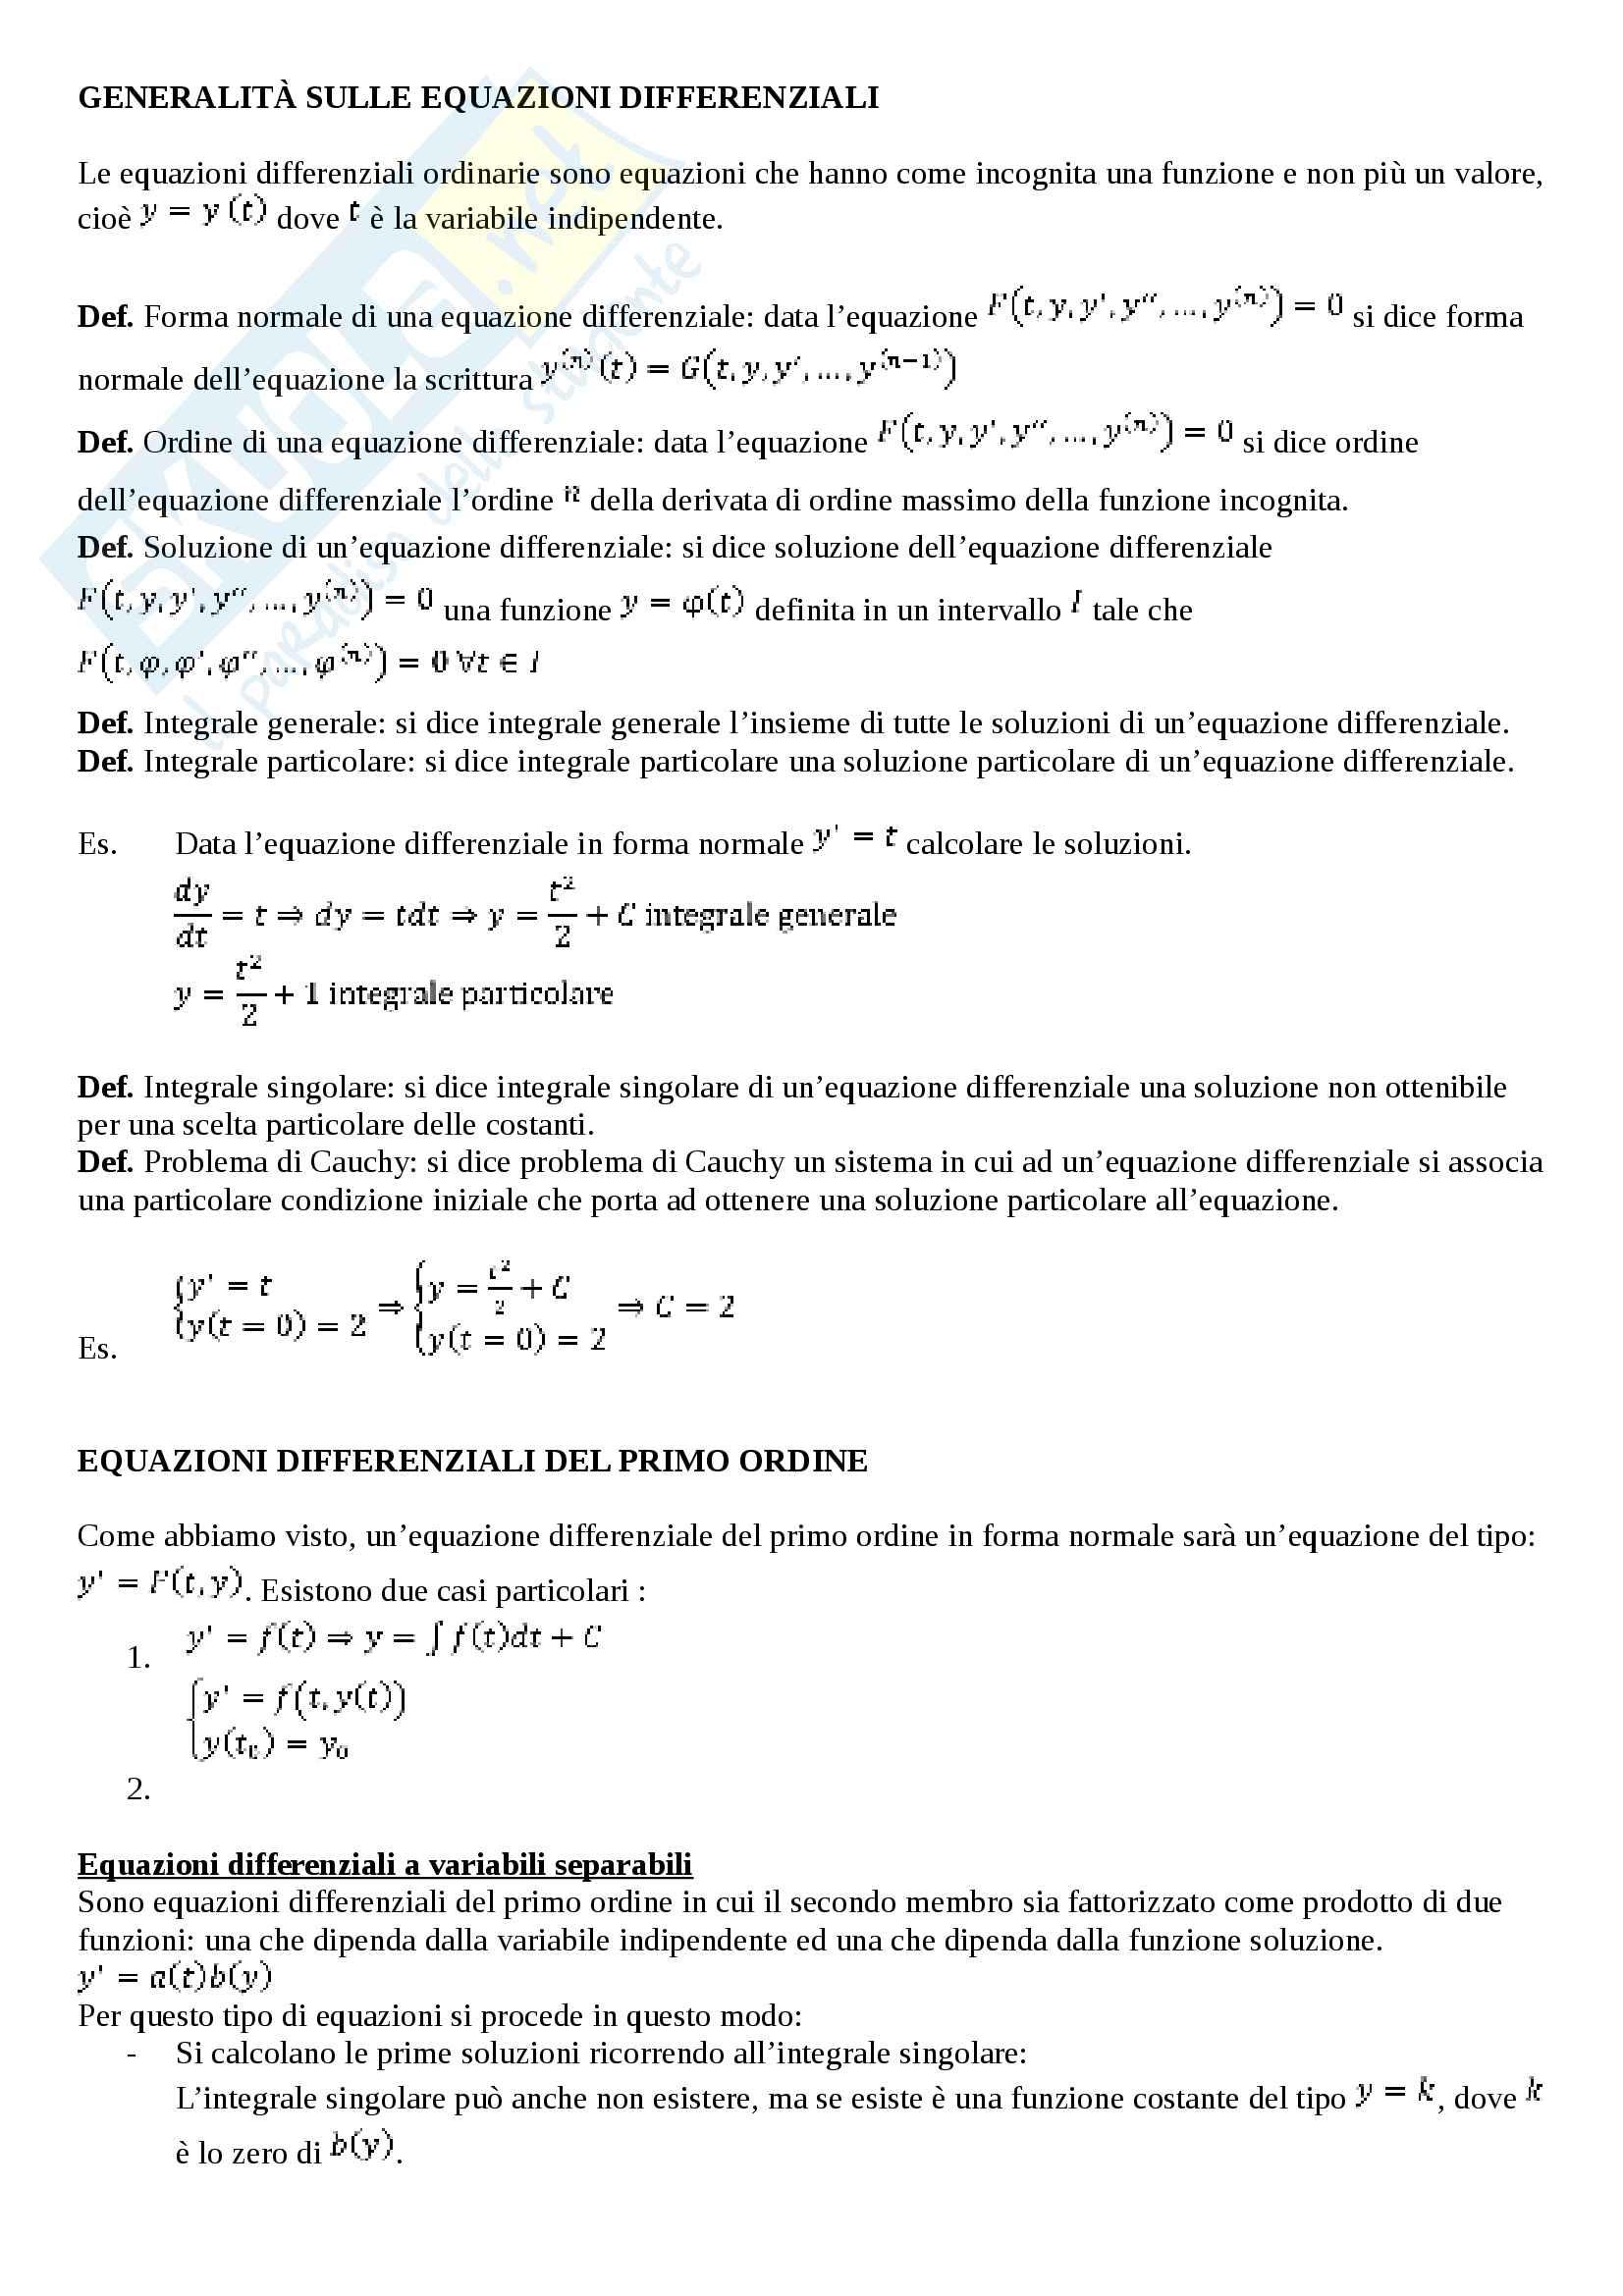 Appunti analisi matematica 2